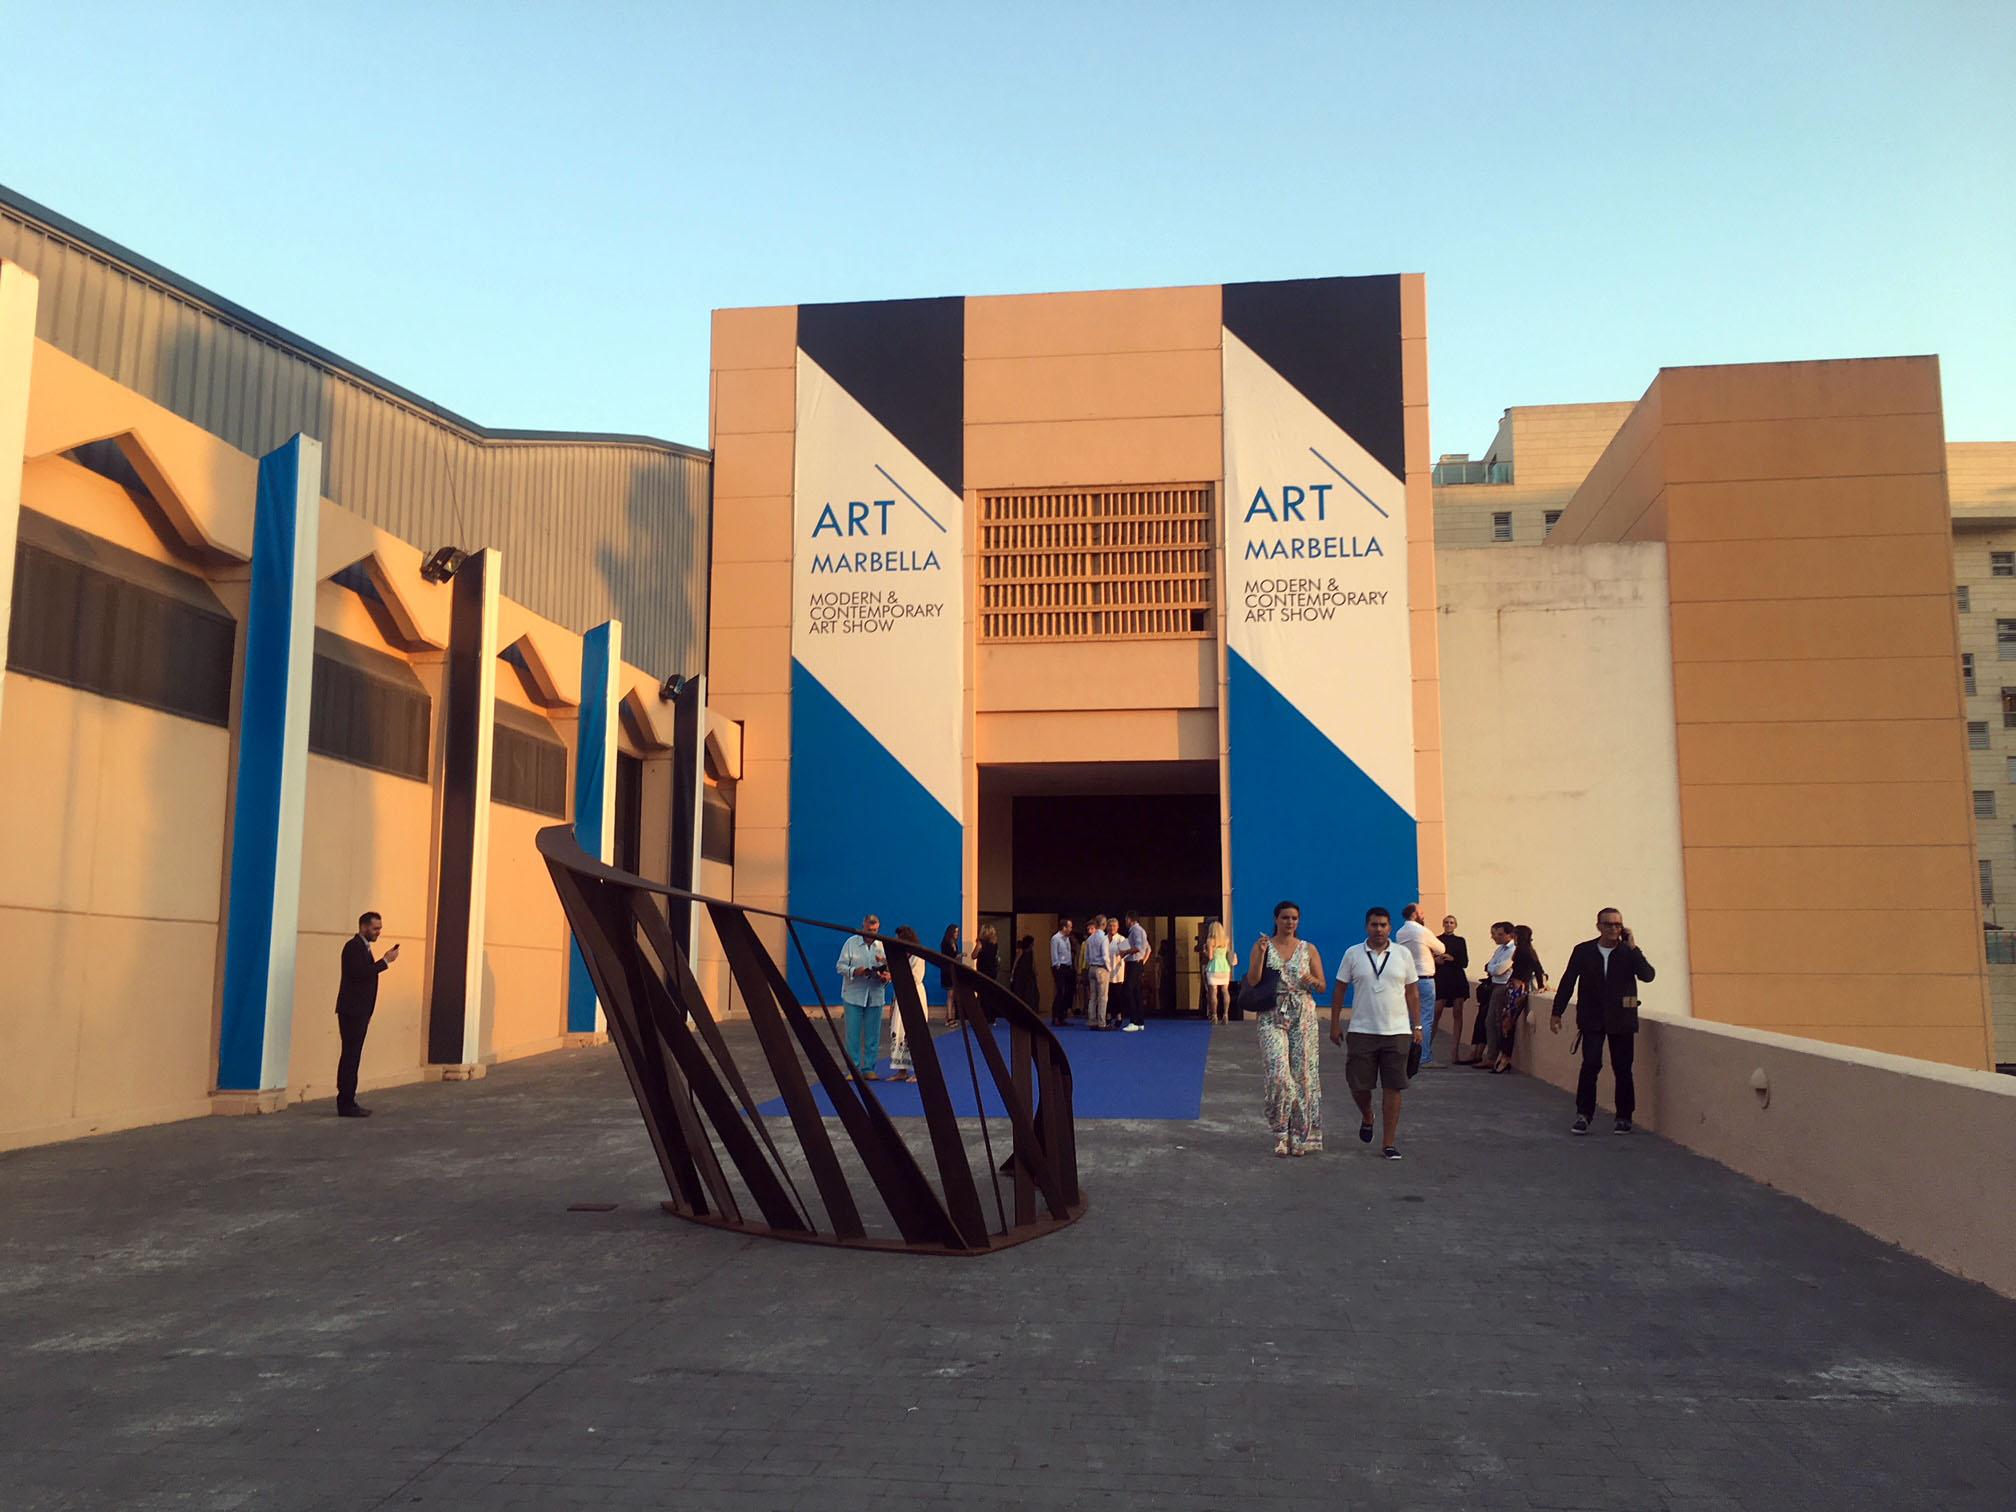 art-marbella-2017-eldevenir-2.JPG